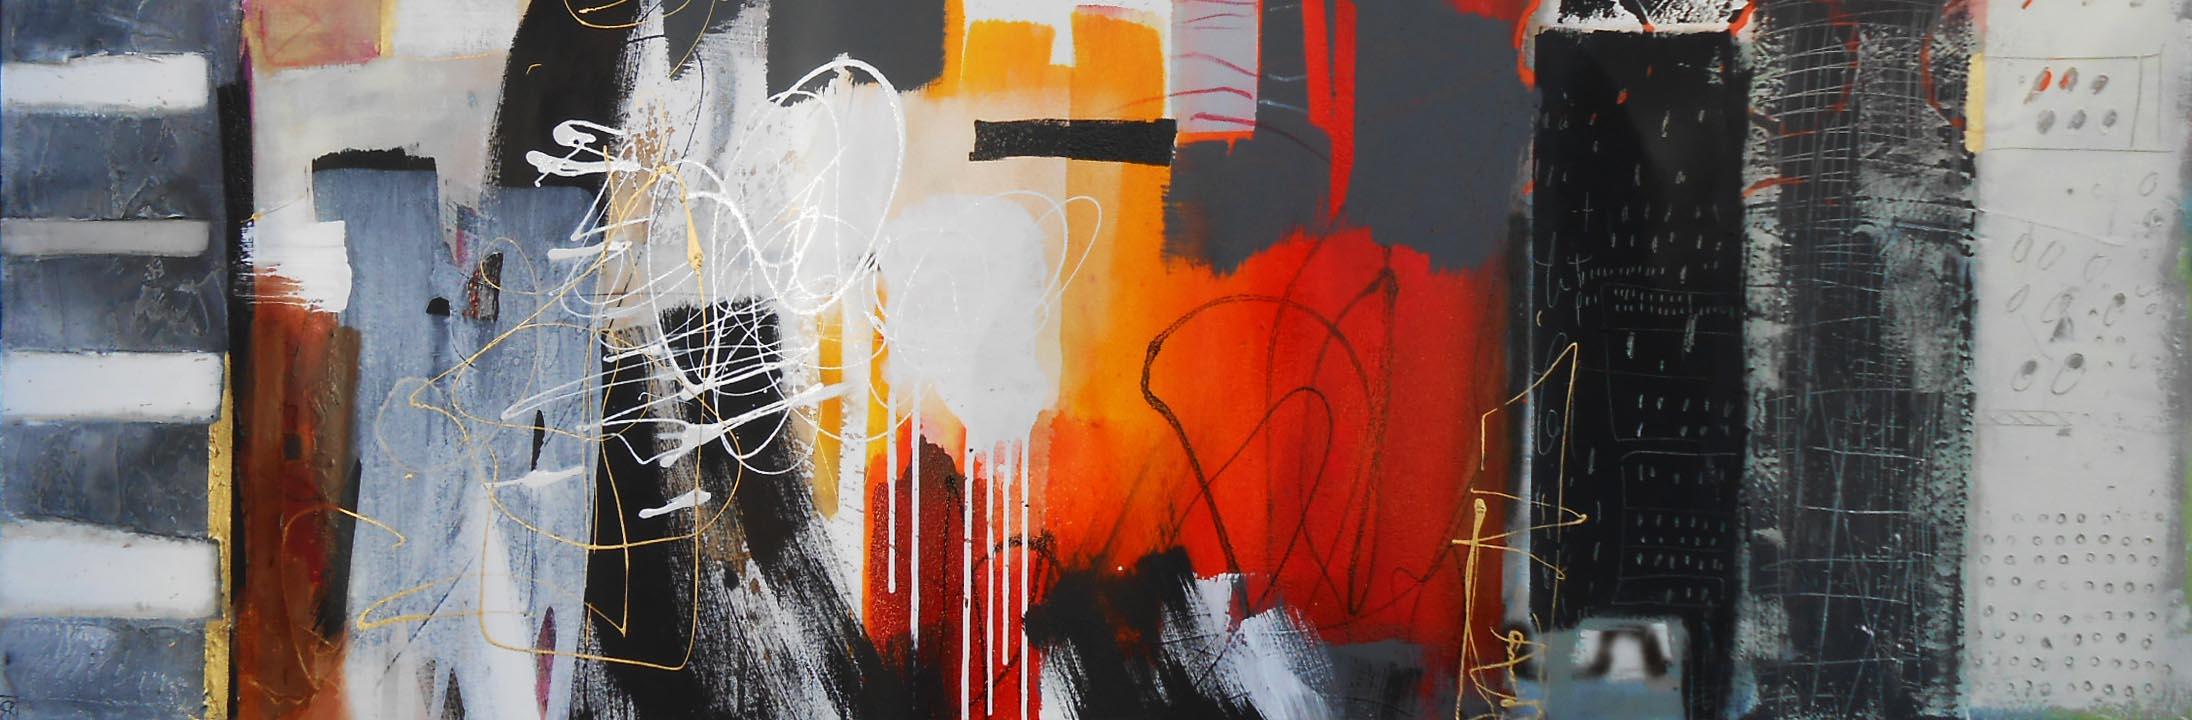 Vicky Sanders Abstract - Big City Life